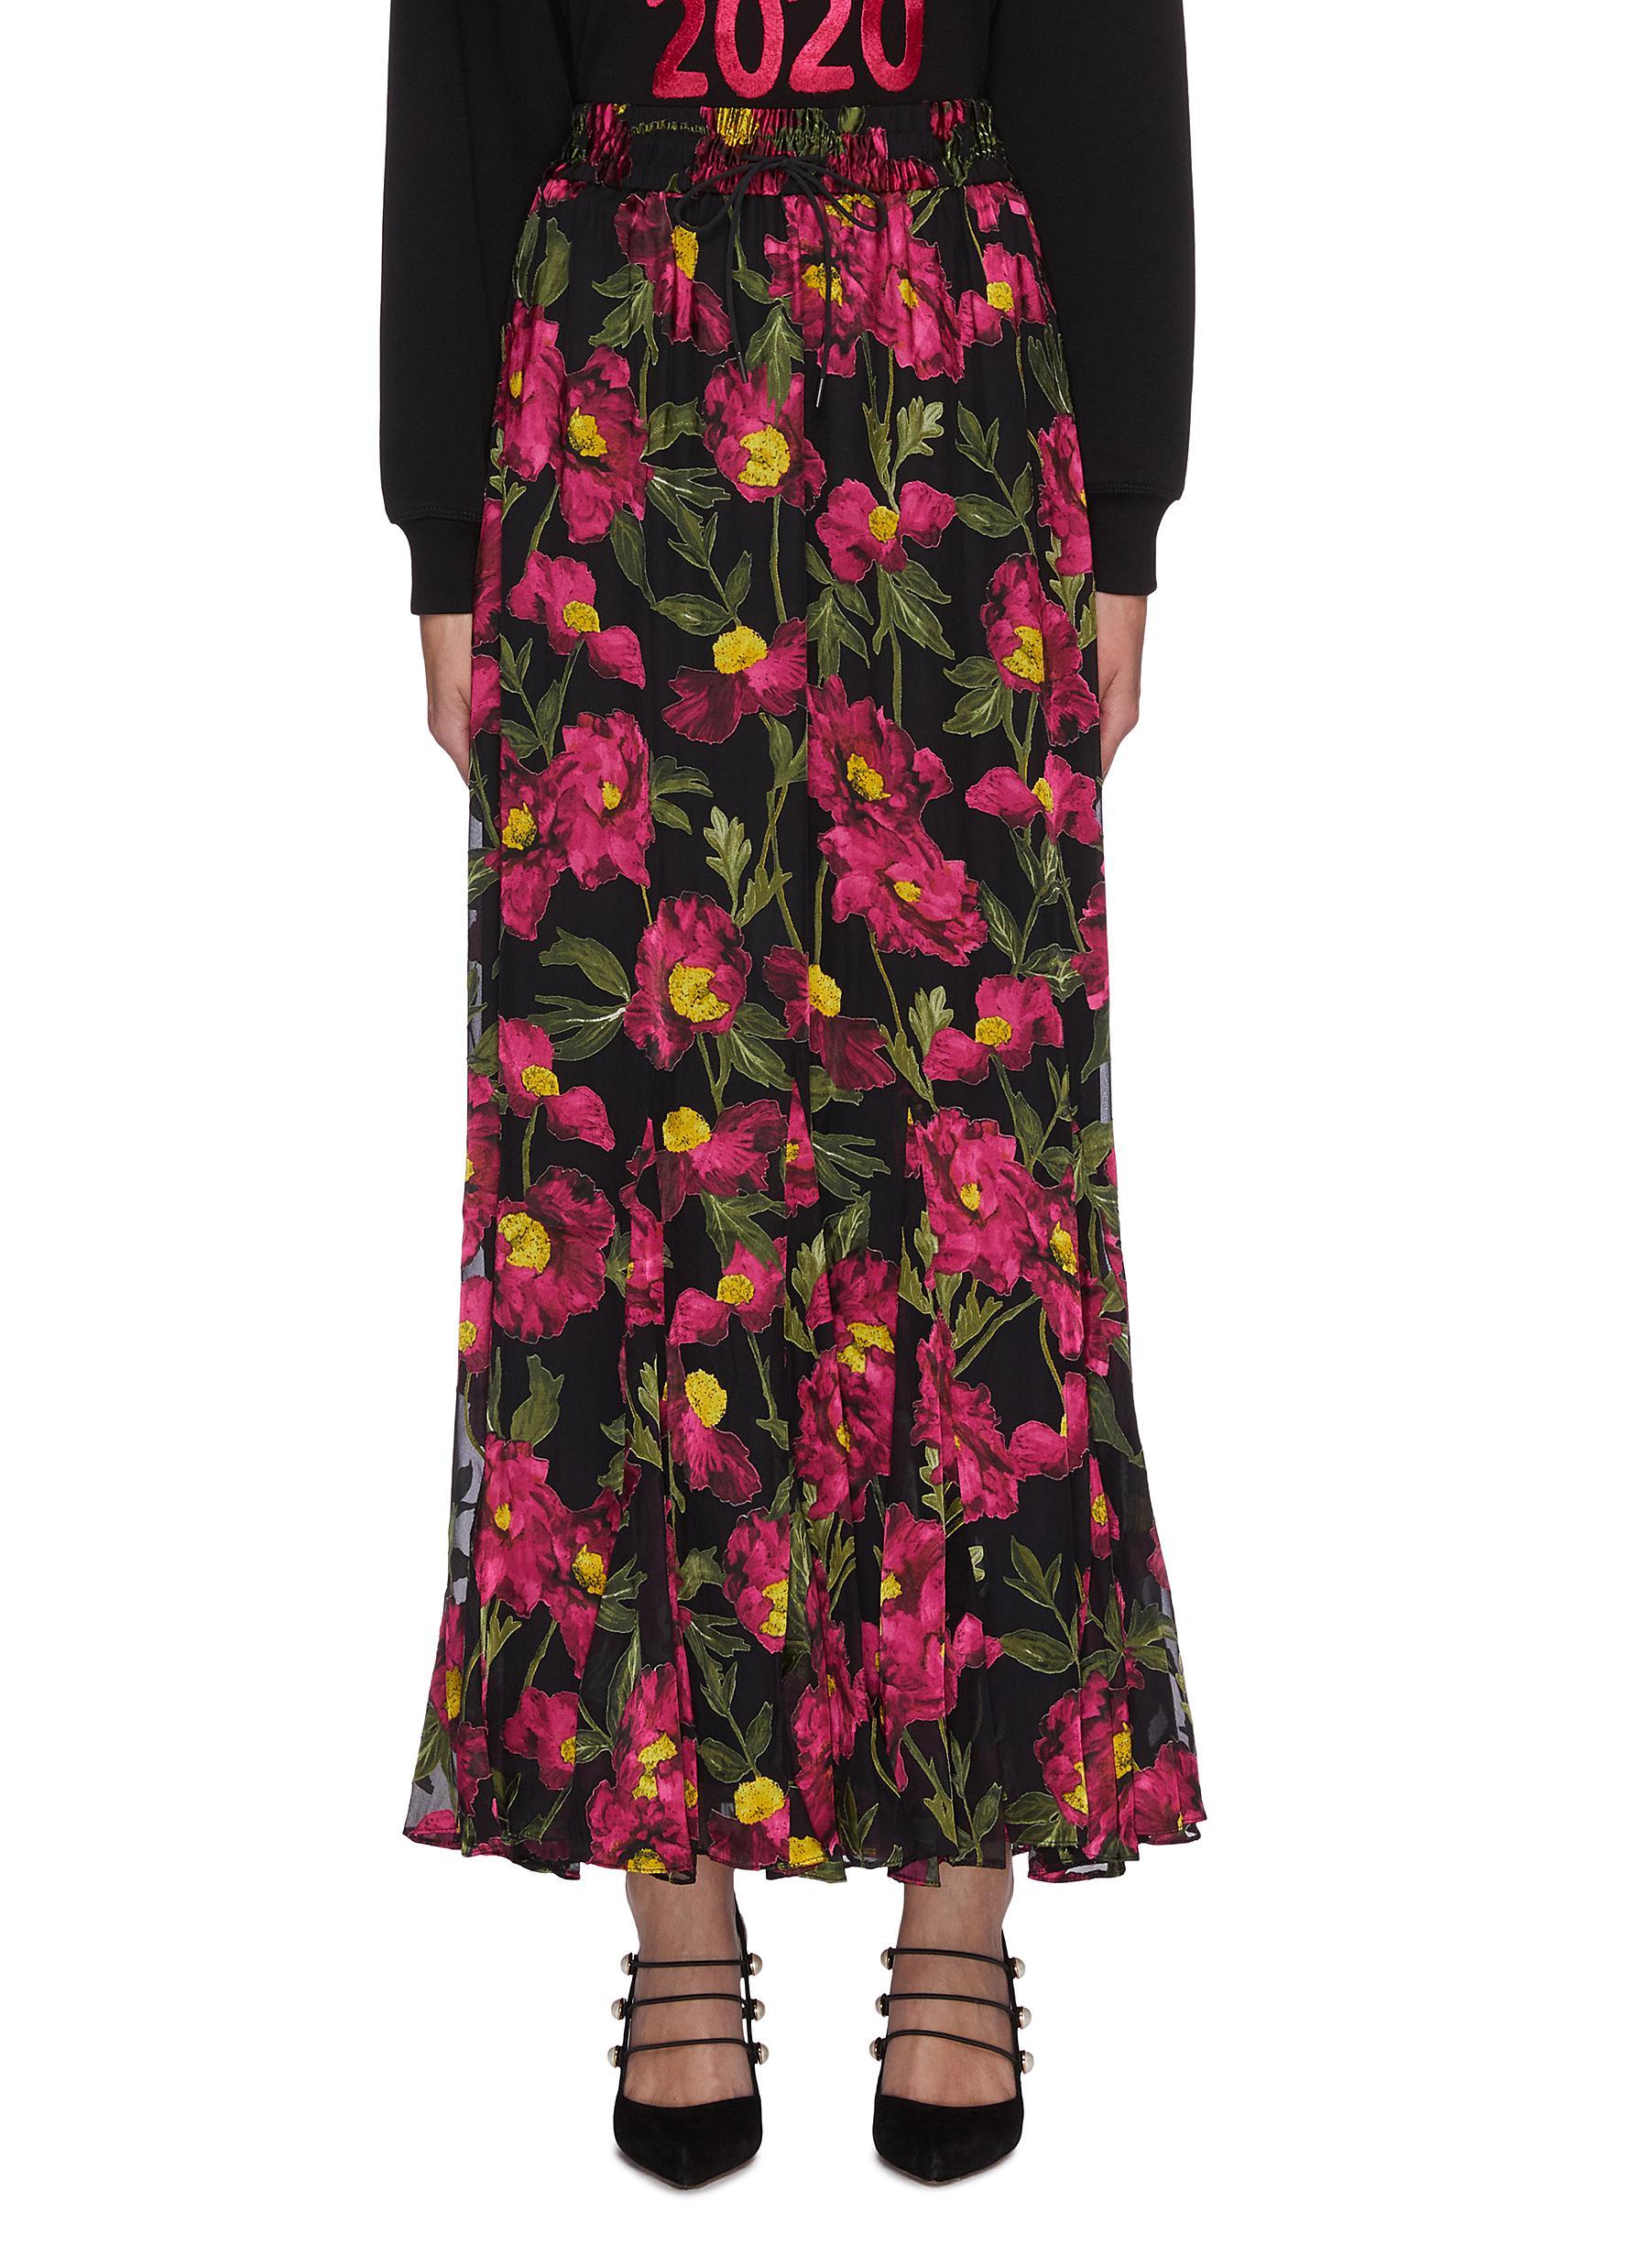 ELZA' Floral Print Maxi Skirt - ALICE + OLIVIA - Modalova